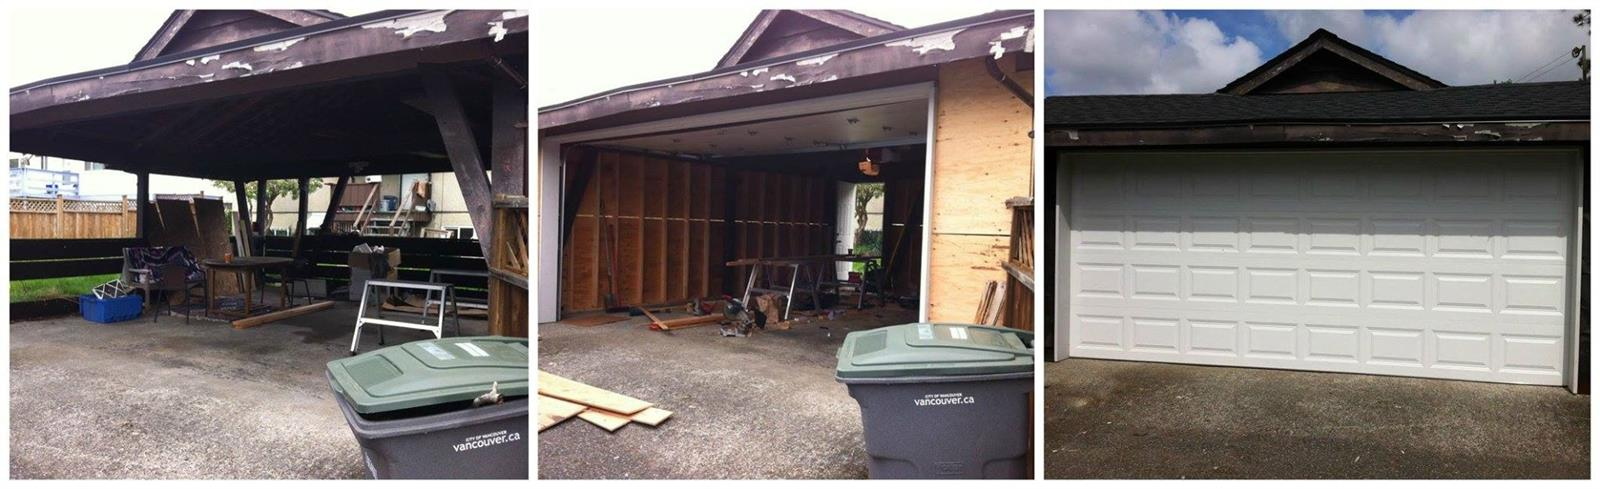 Vancouver Carport Conversion to Garage